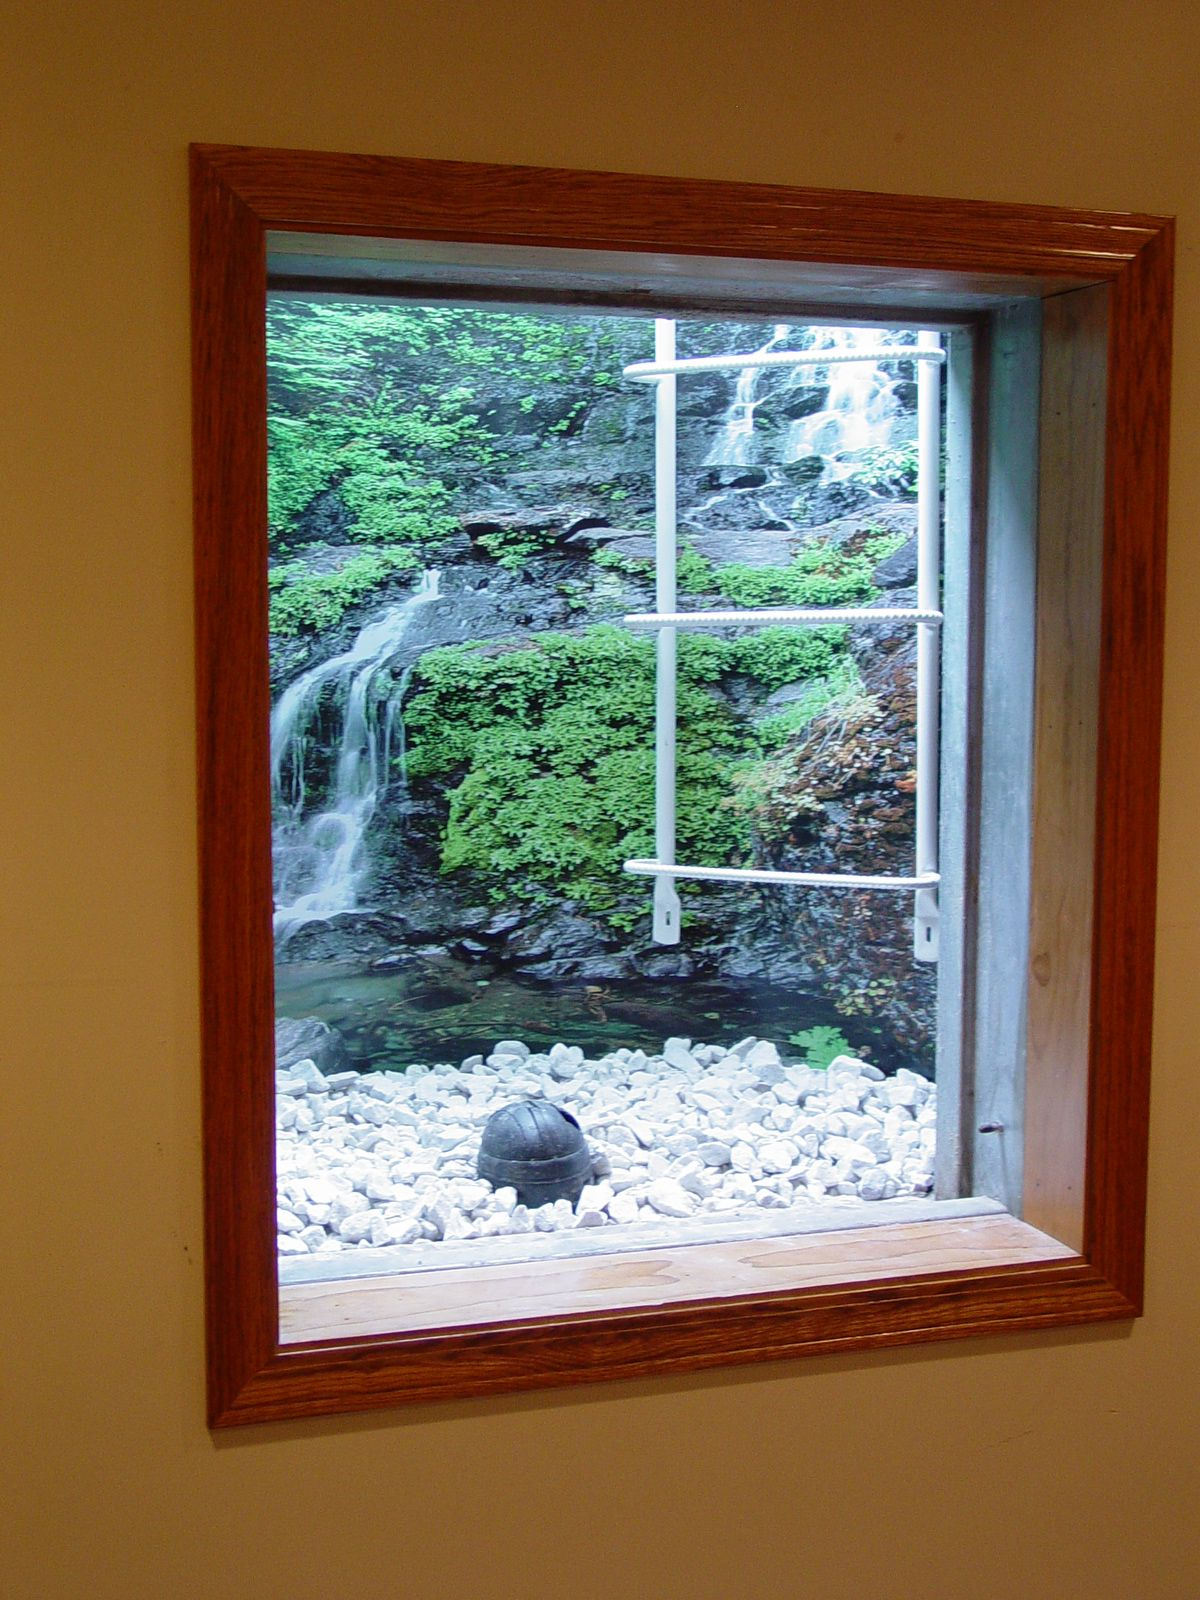 window well design ideas on ideas for basement window covers basement windows window well basement window well basement windows window well